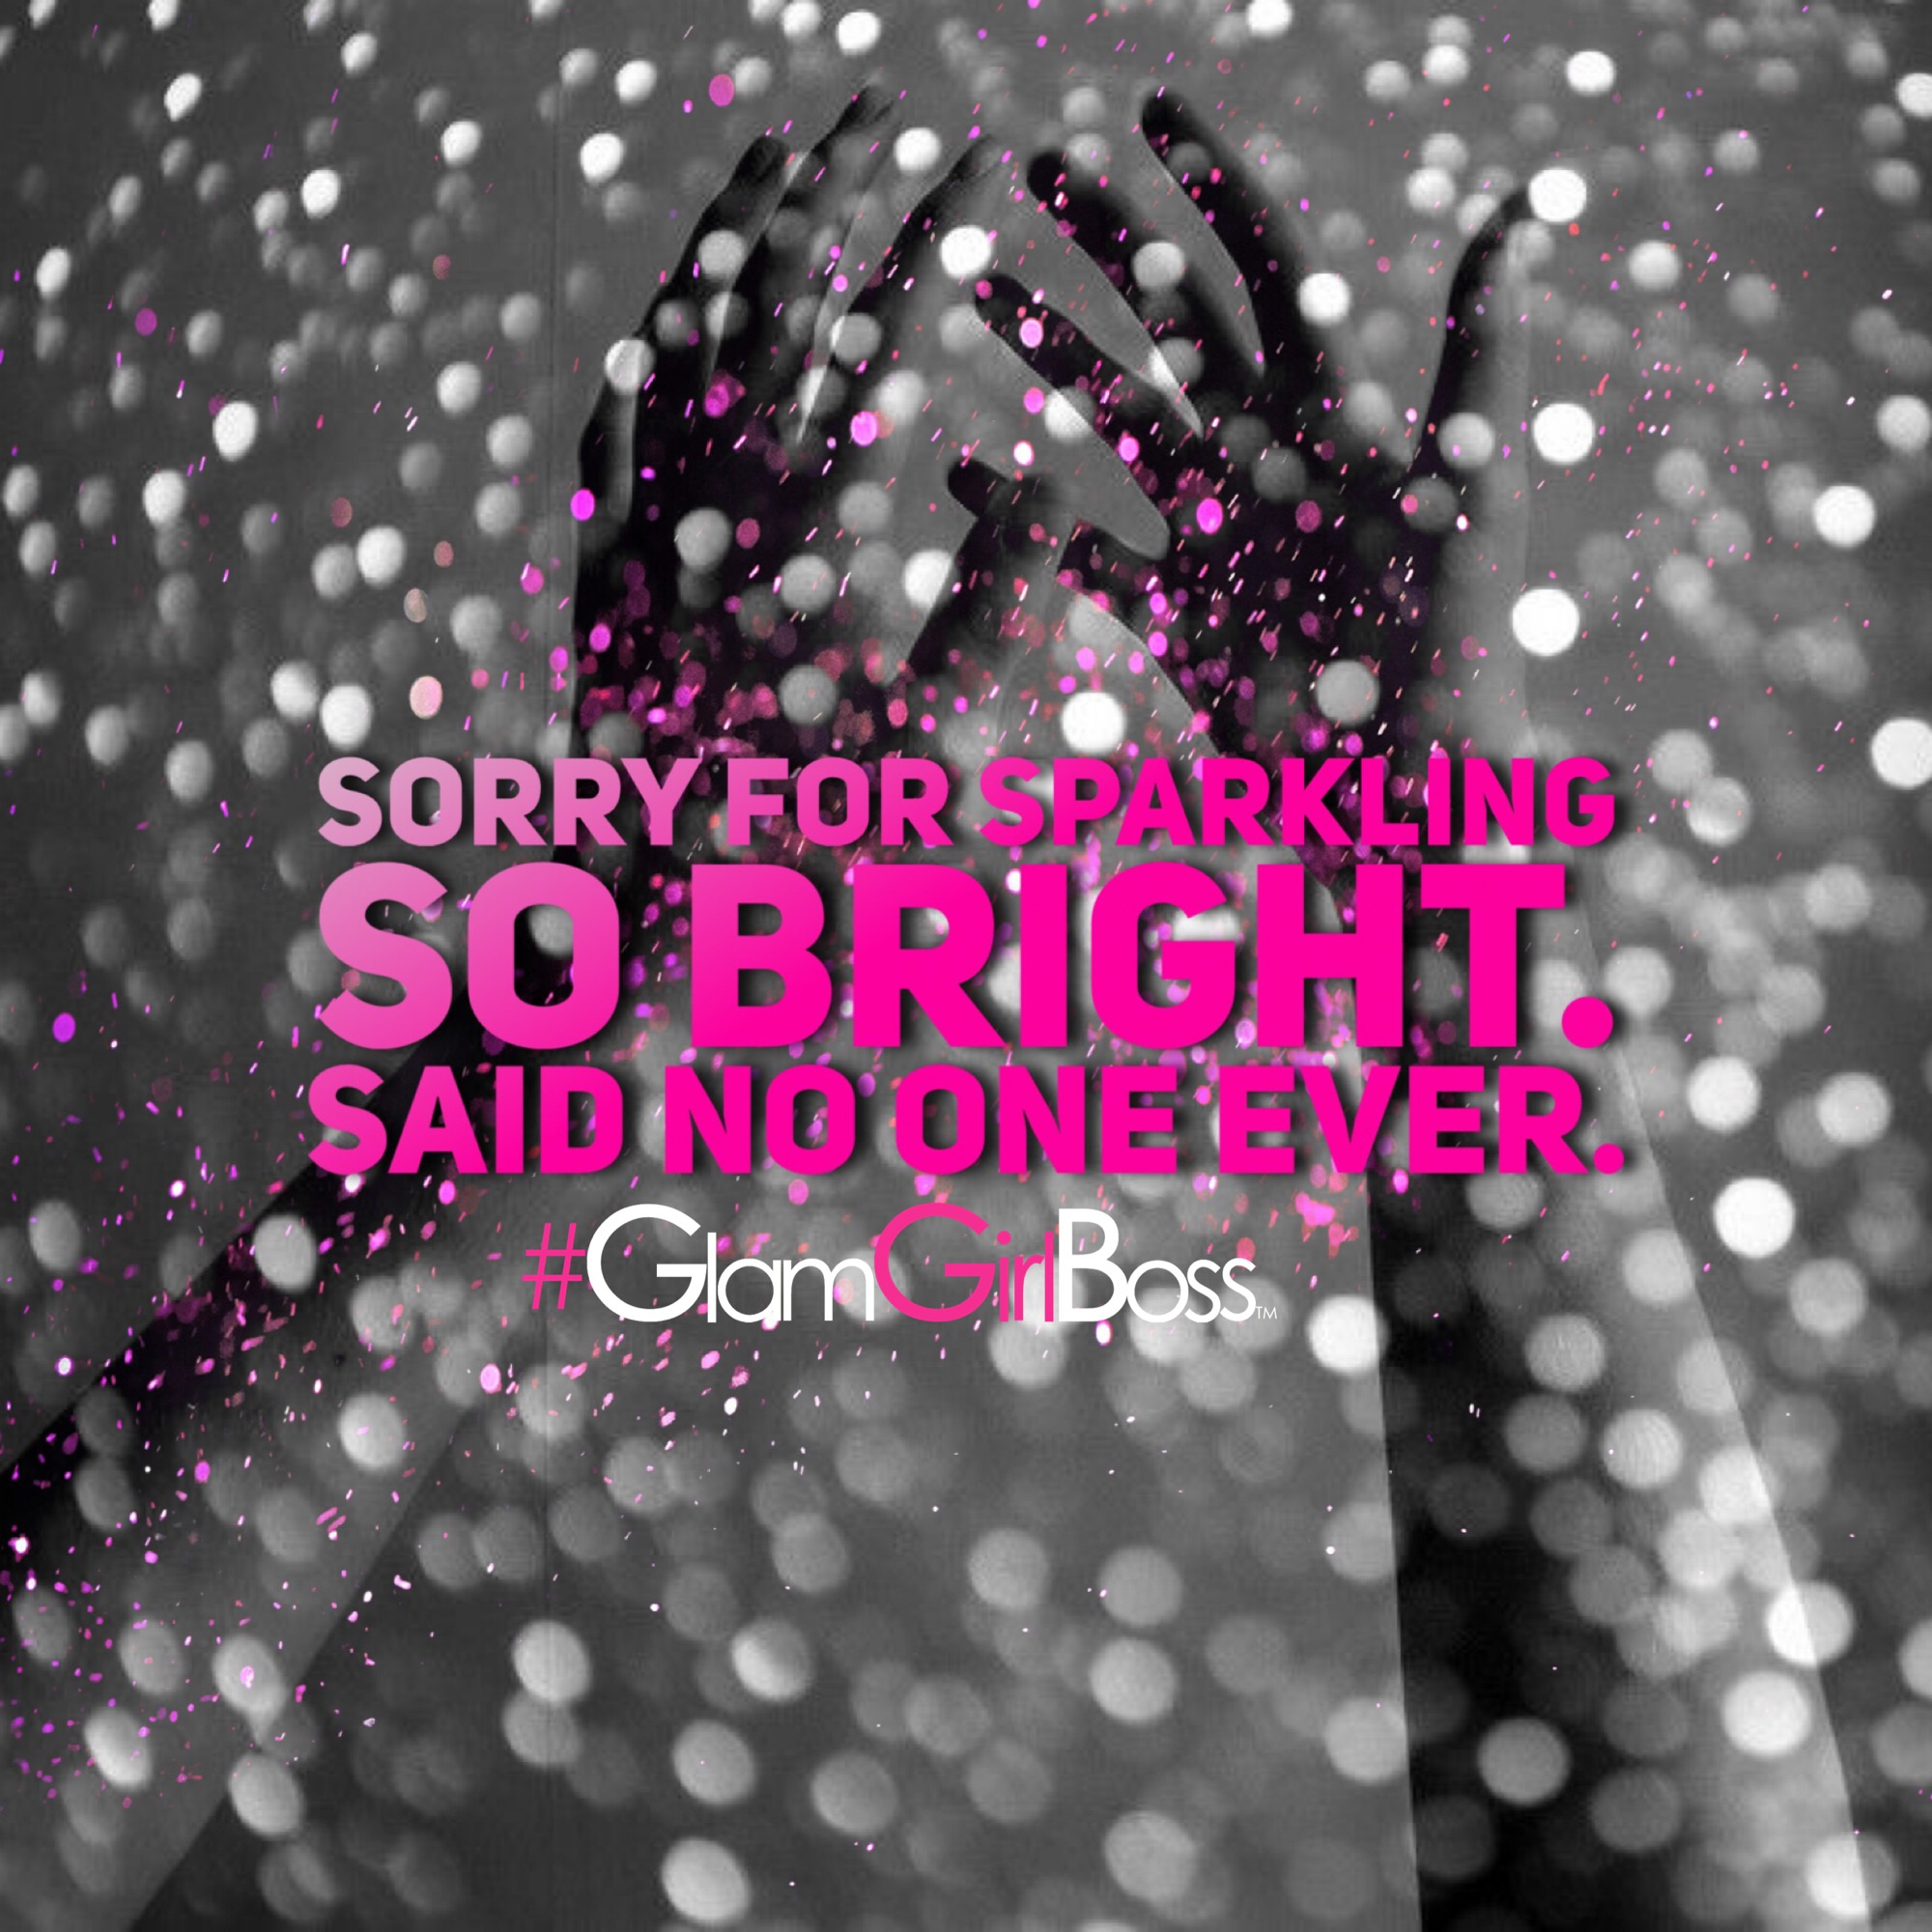 Sparkling so bright.